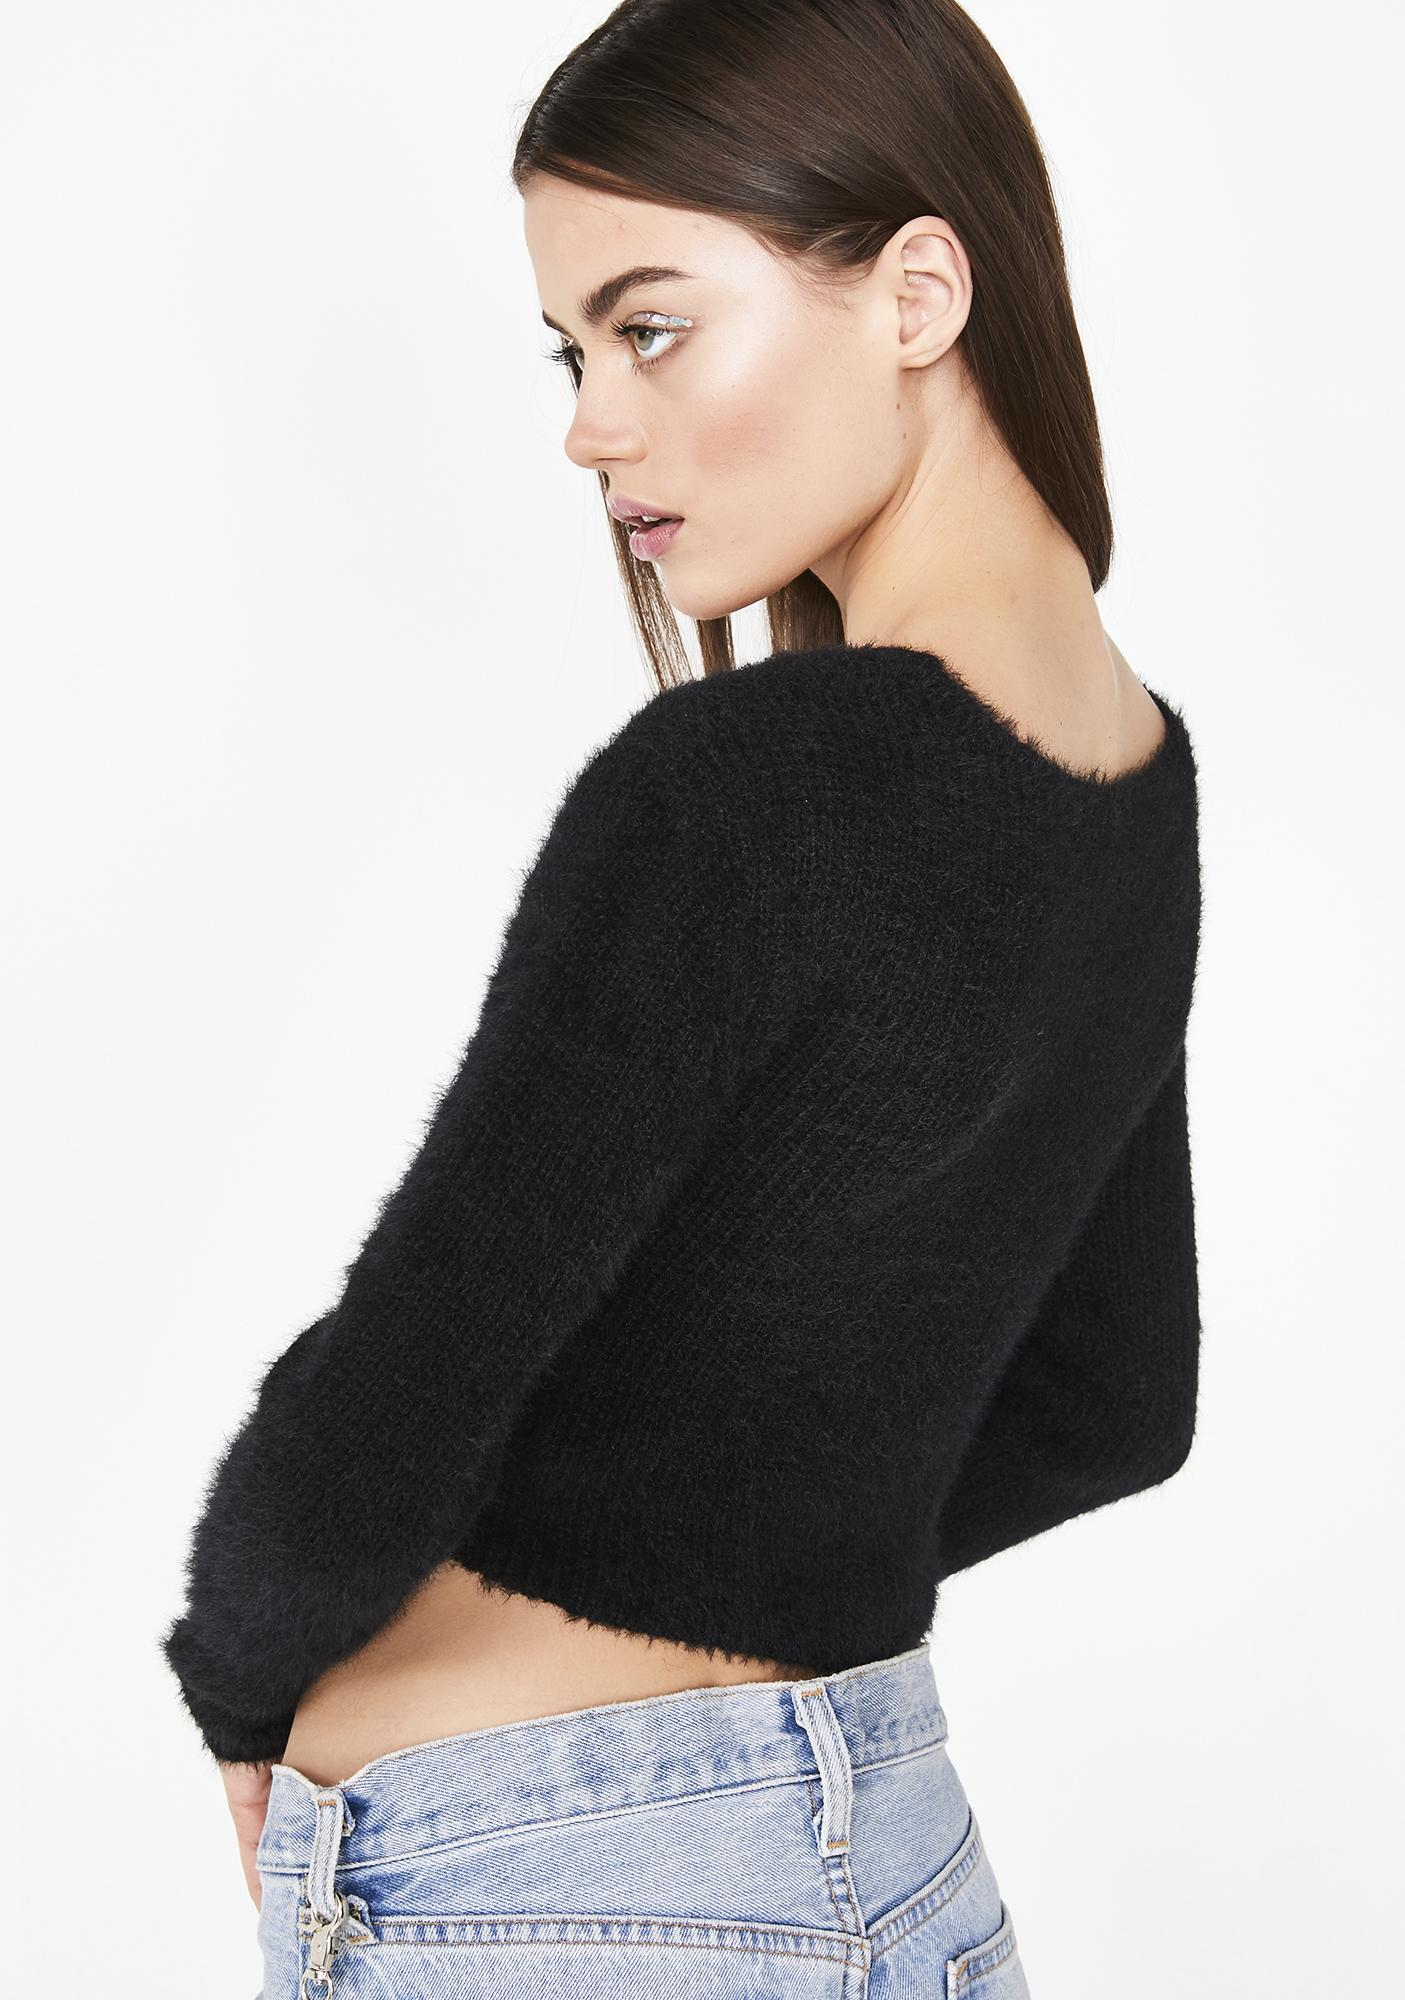 Late Nightz Wrap Sweater